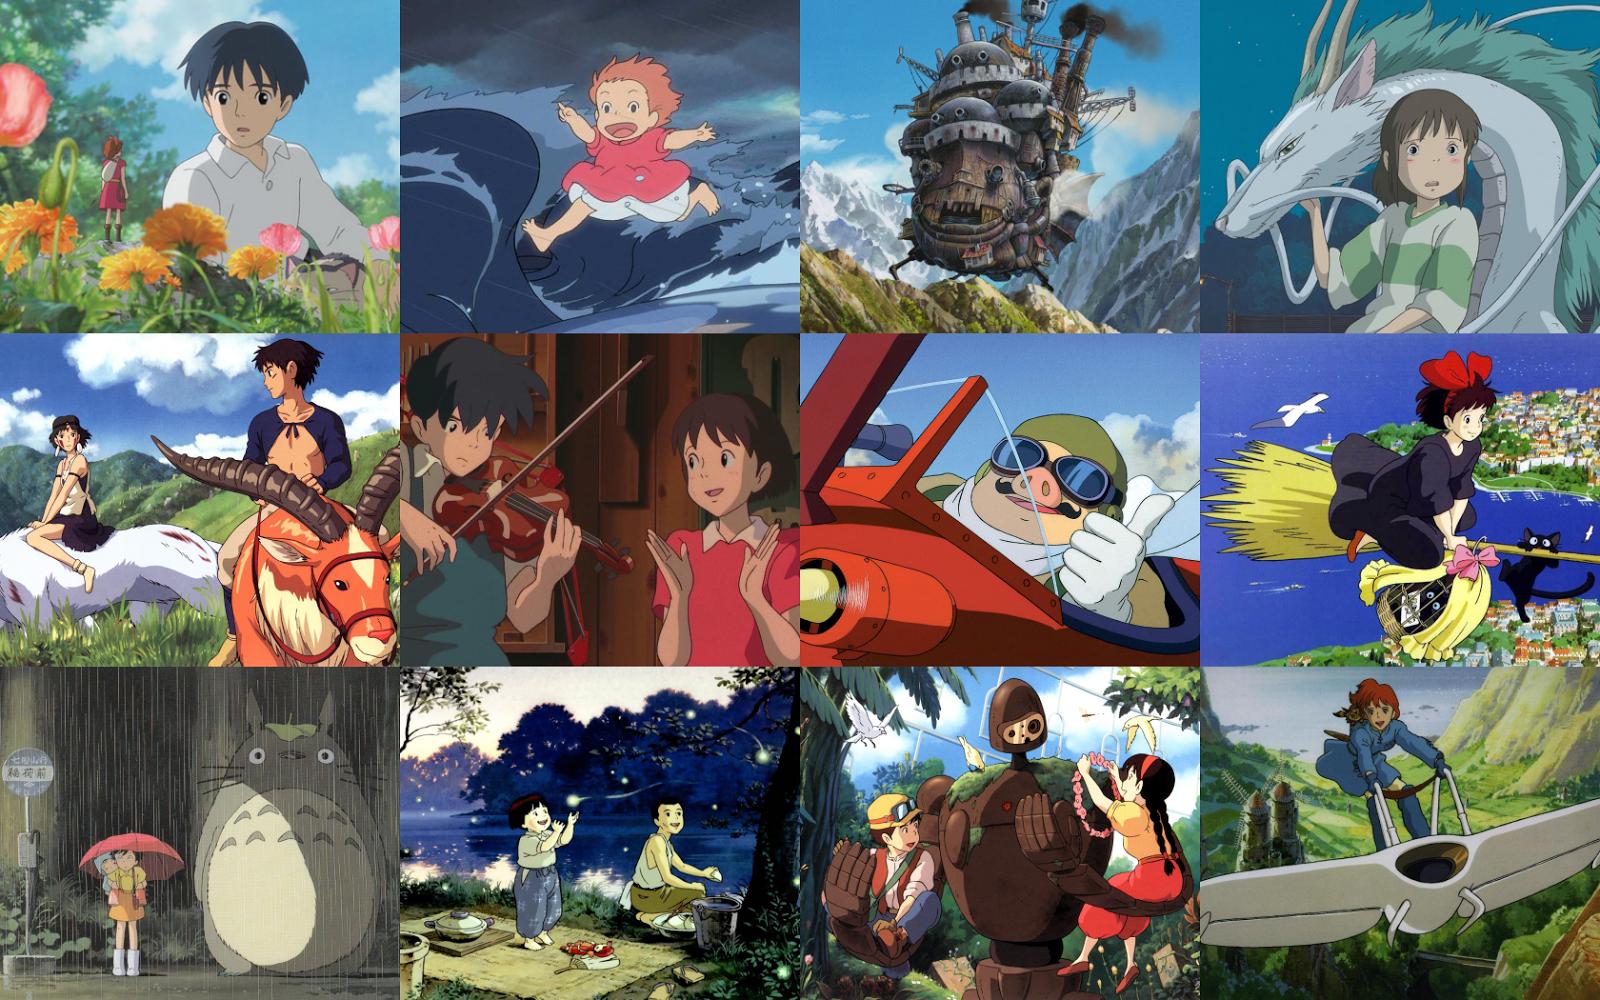 In the Frame Film Reviews Studio Ghibli Desktop Wallpaper